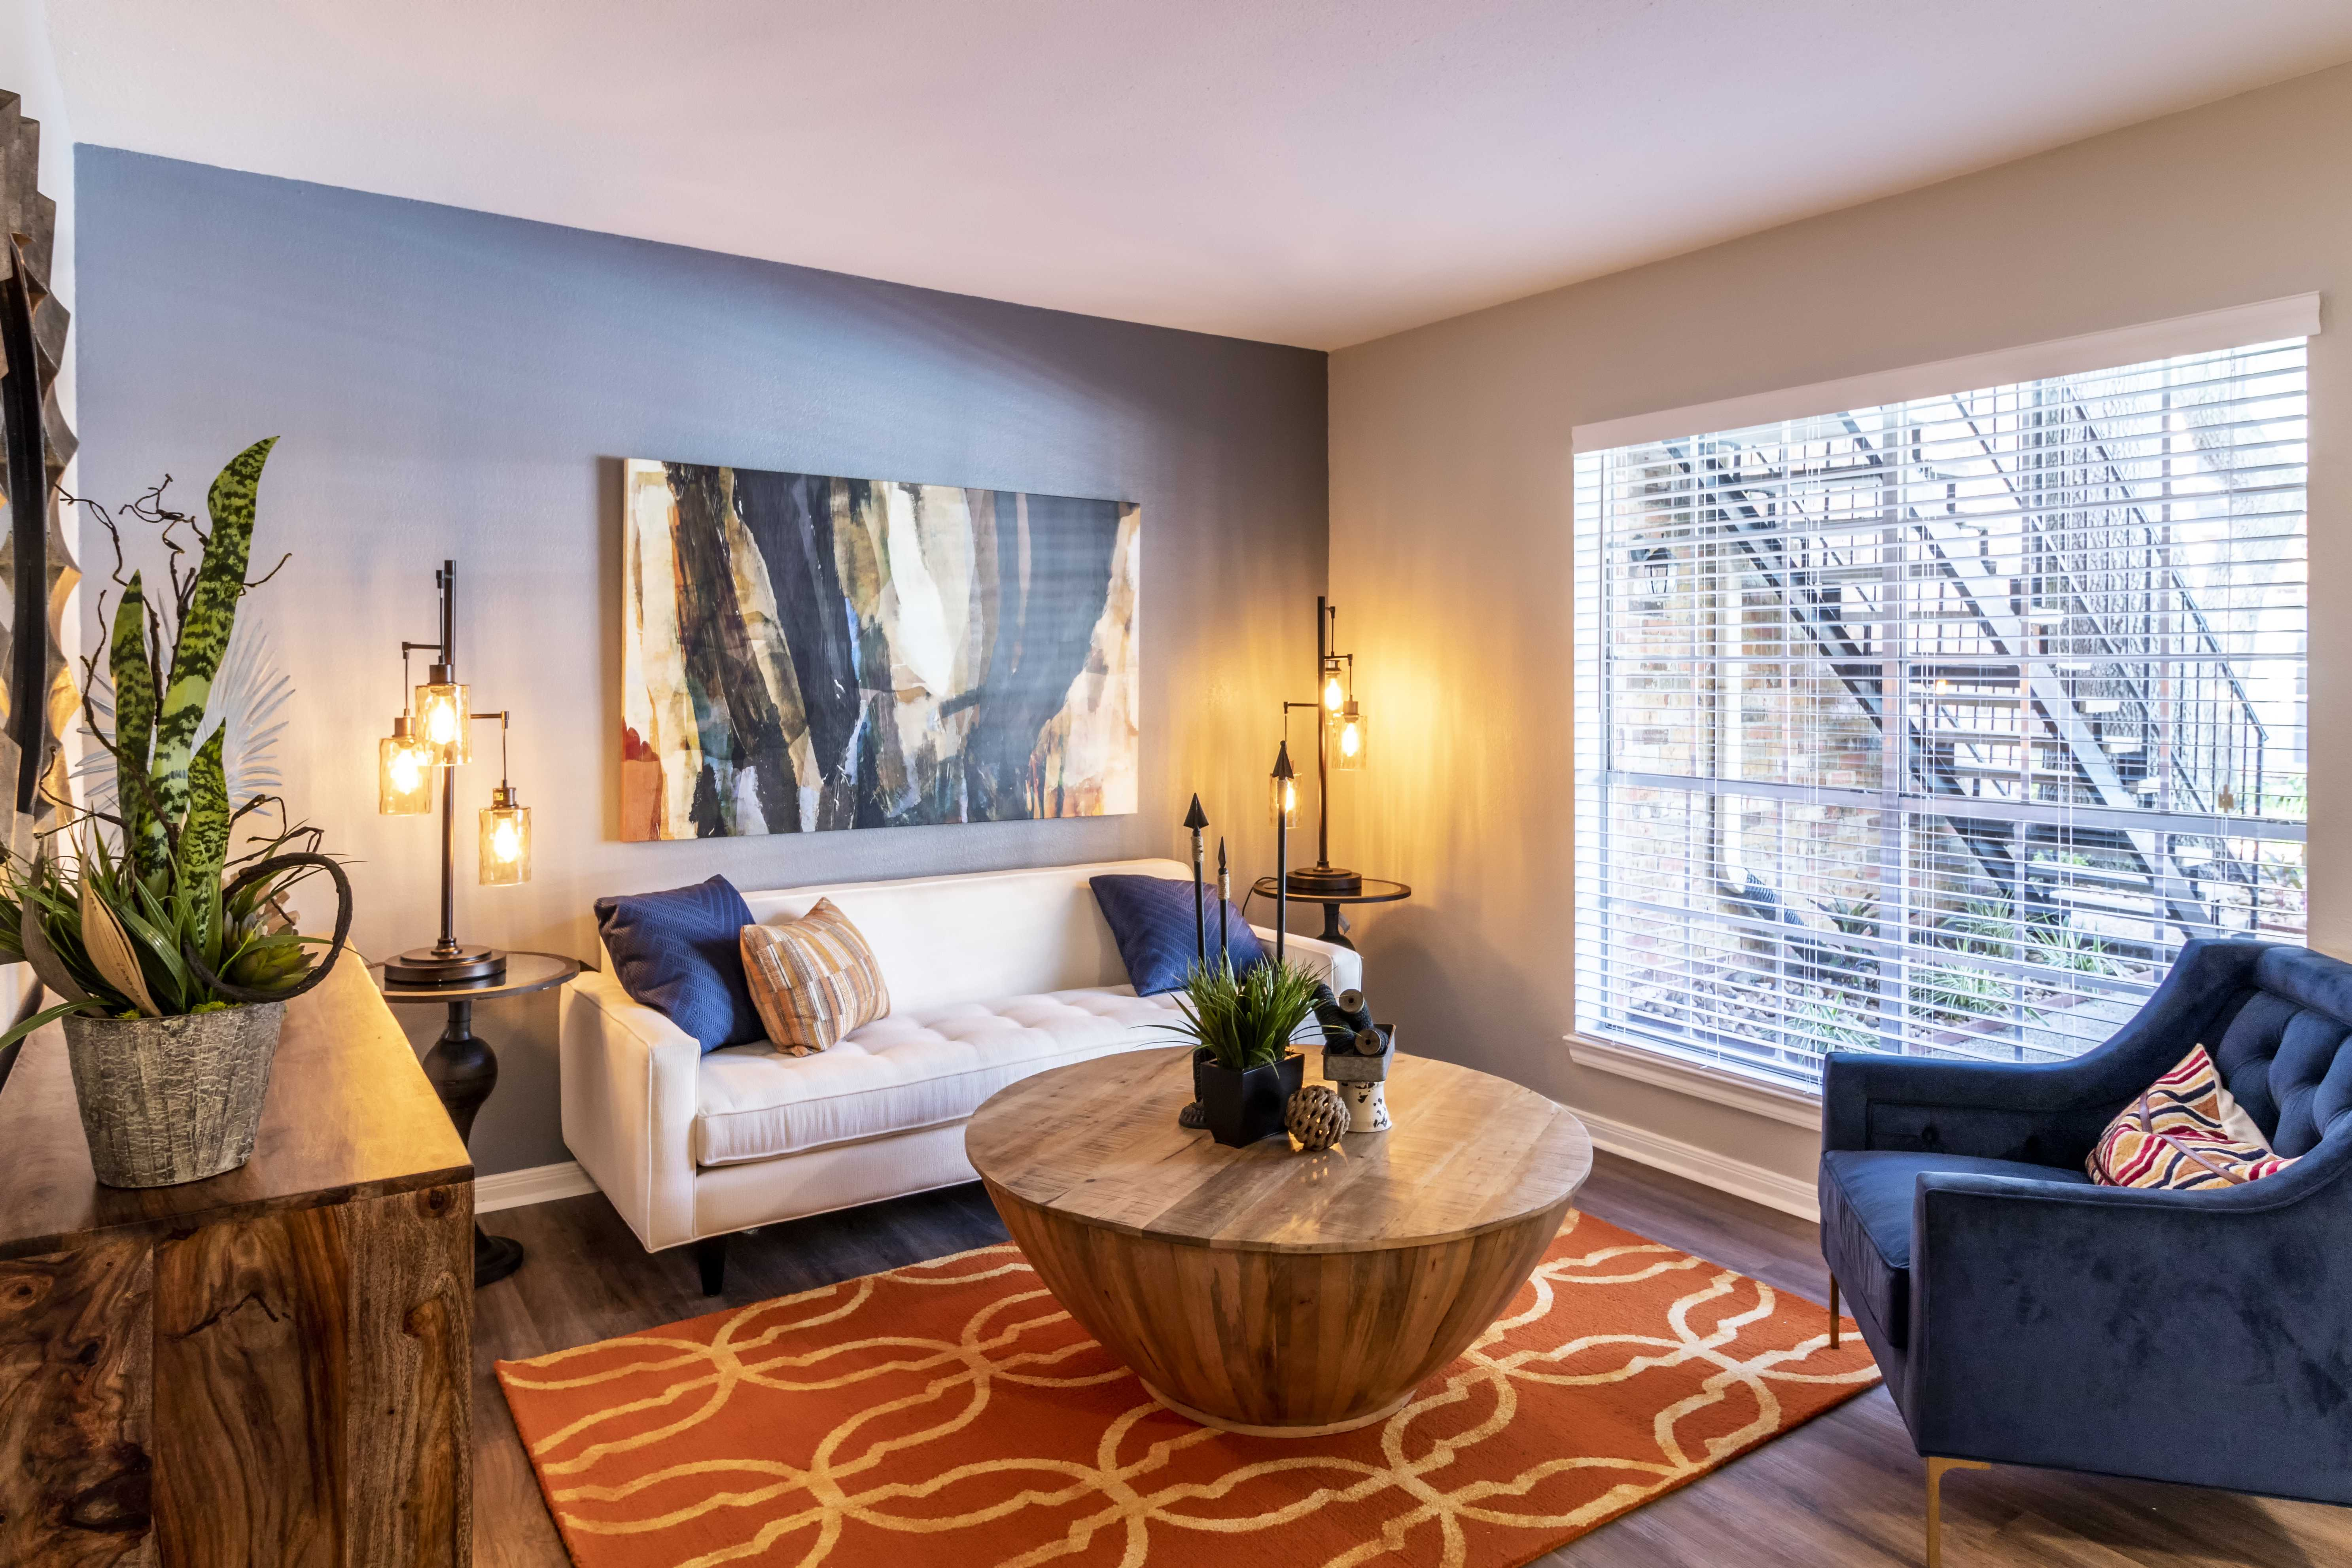 3 bedroom apartments for rent in houston tx 305 rentals rentcaf rh rentcafe com